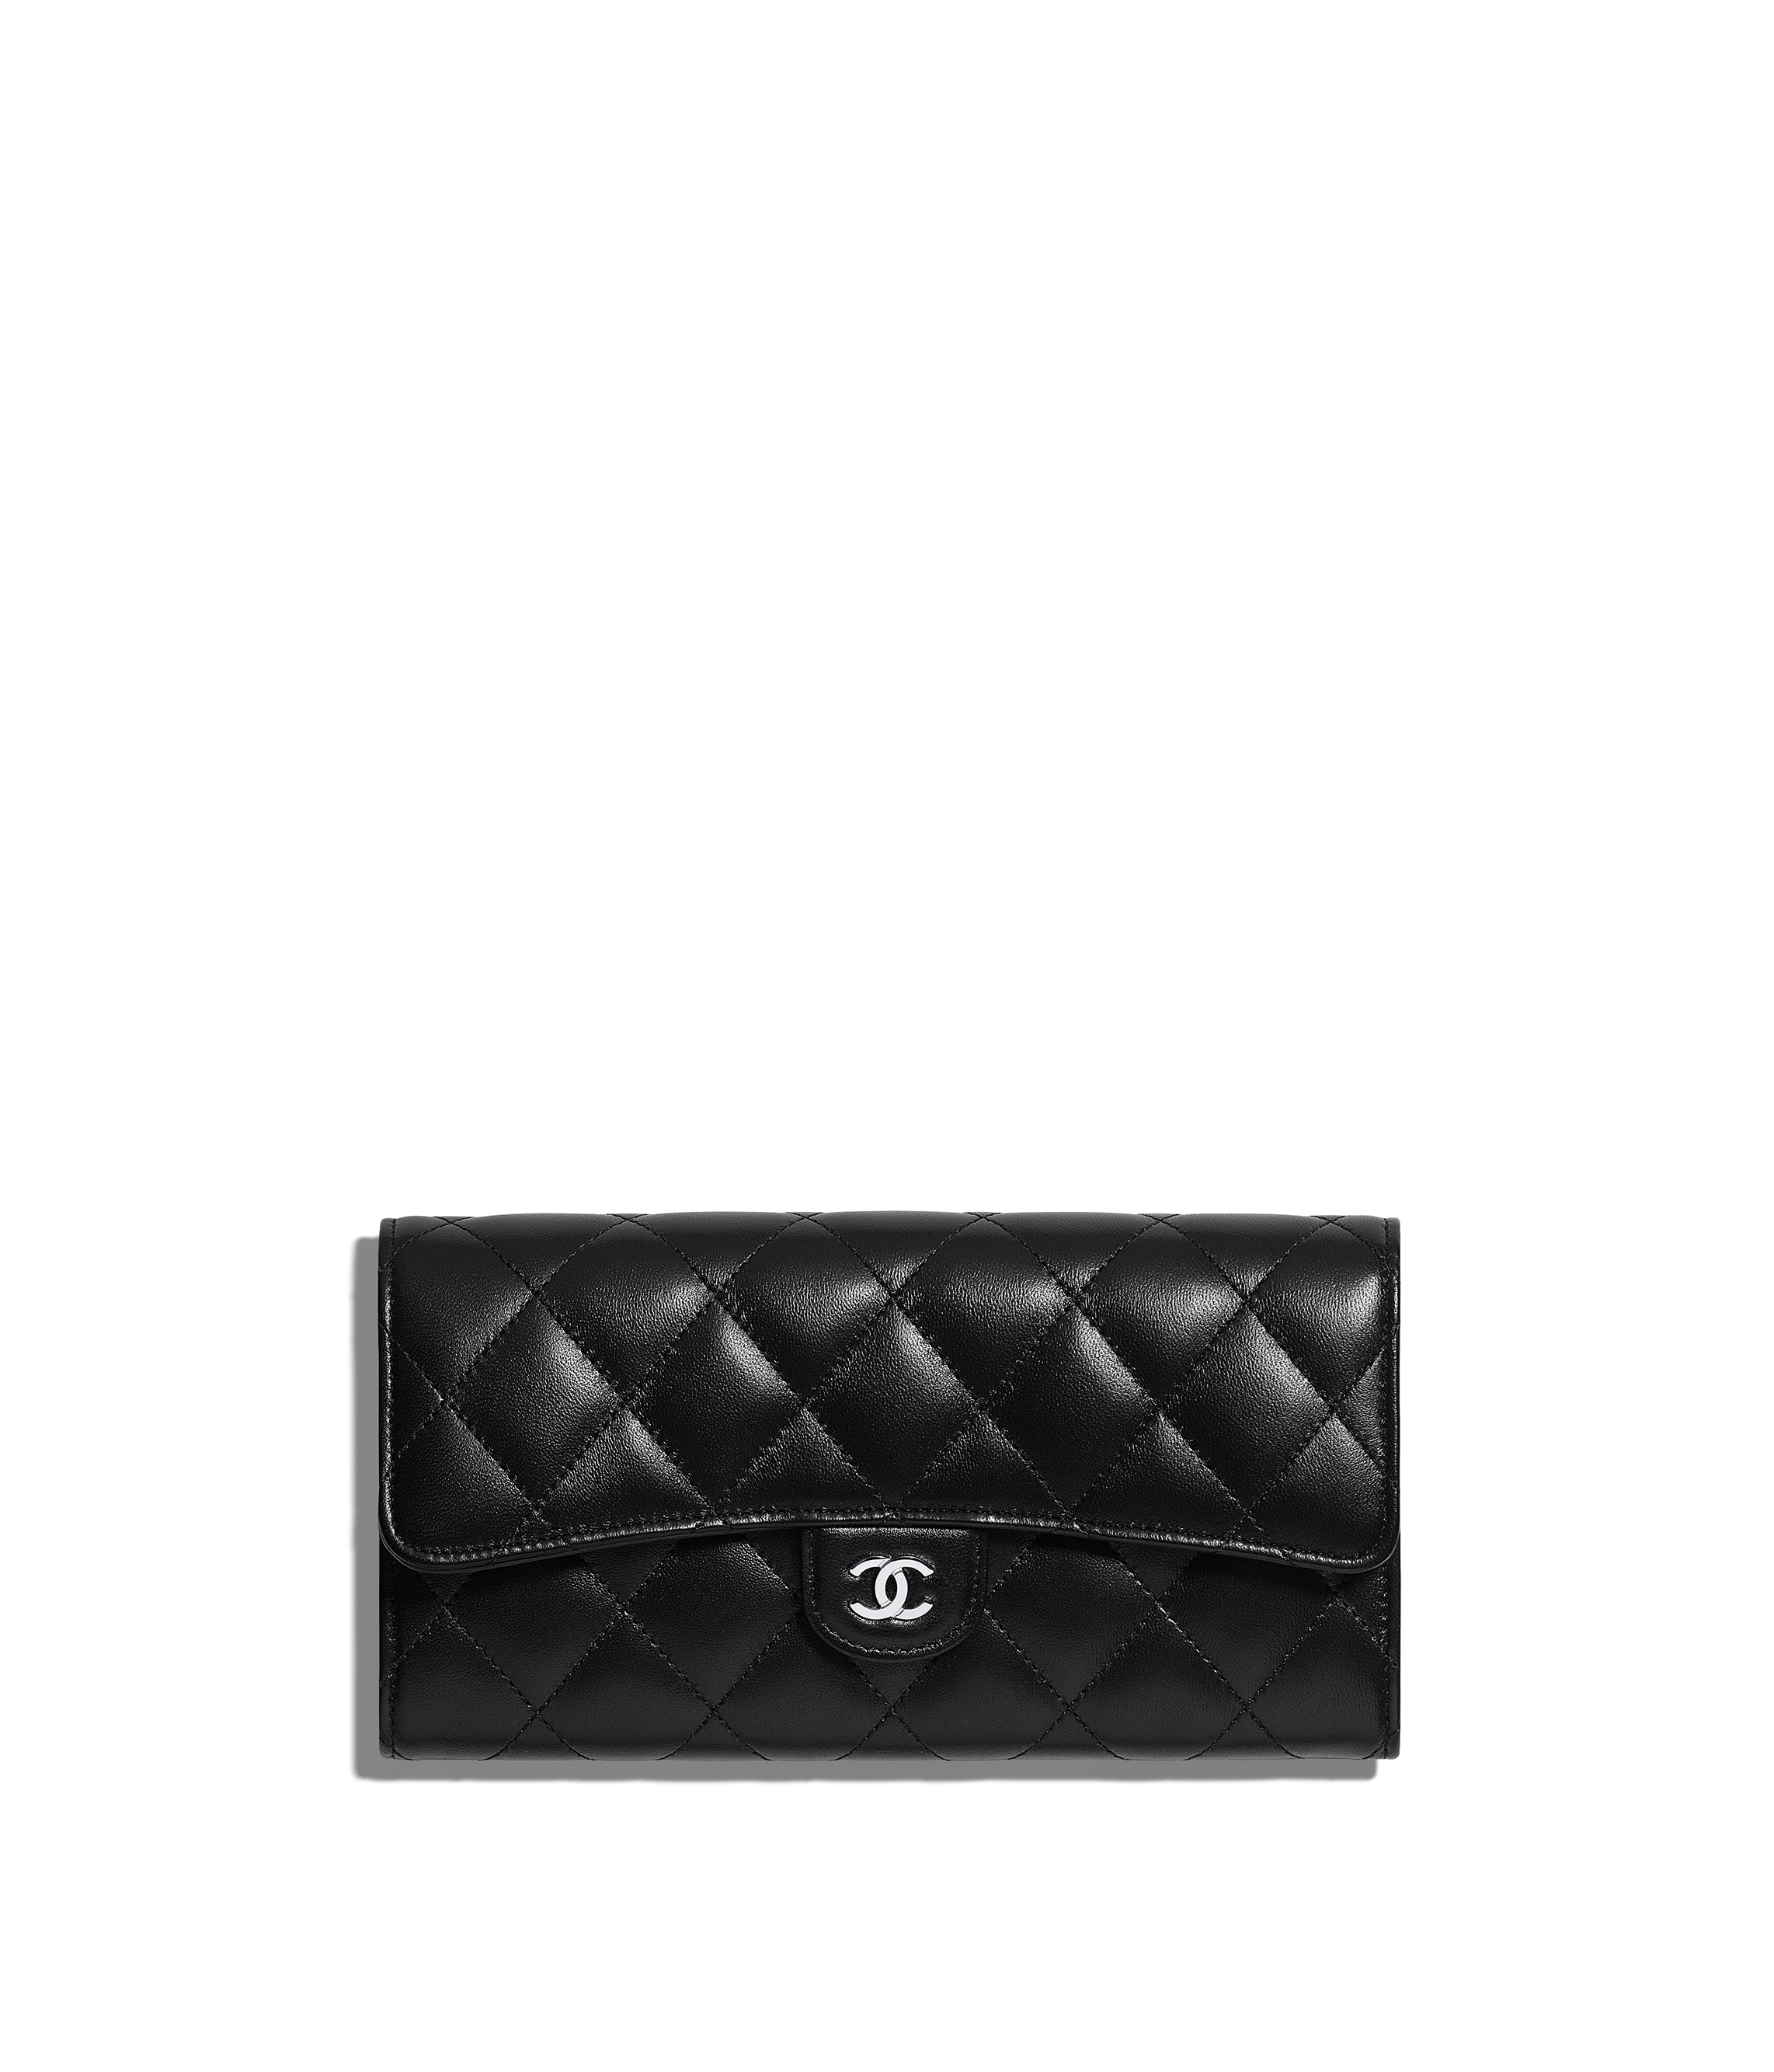 900dc18639fa Classic Long Flap Wallet, lambskin & silver-tone metal, black - CHANEL